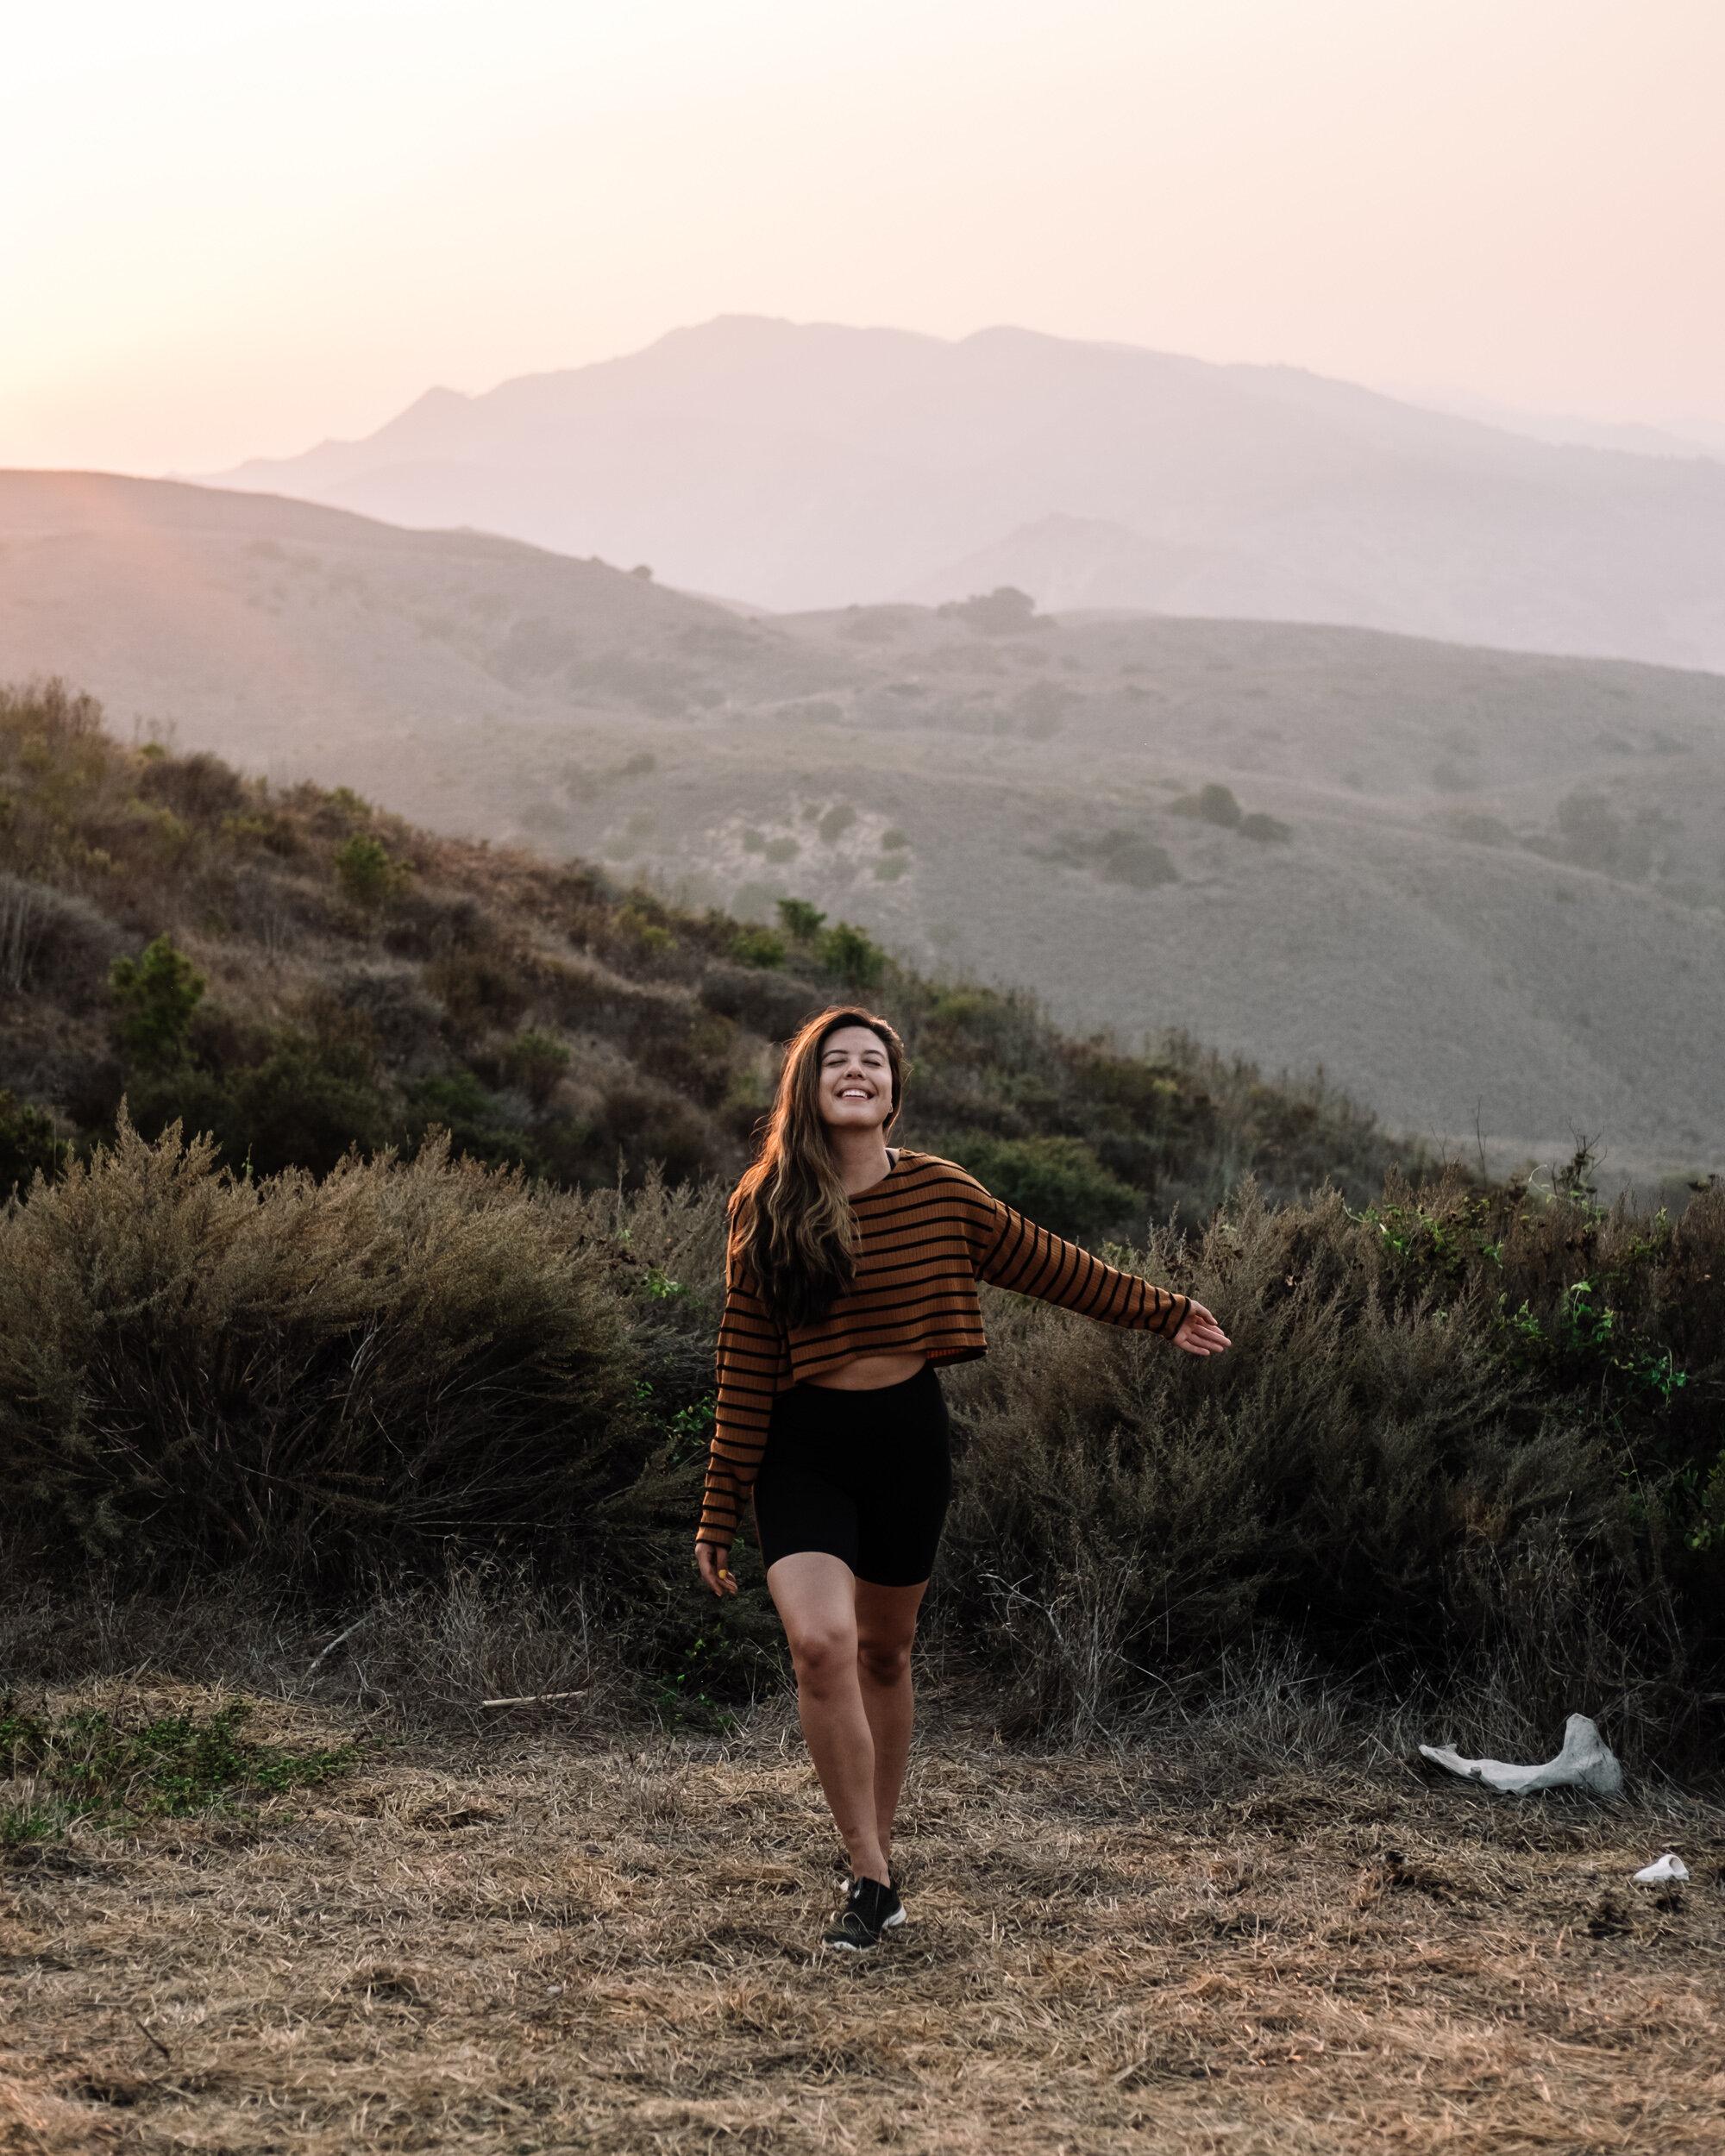 Rachel Off Duty: Woman admiring Sunset at Channel Islands National Park